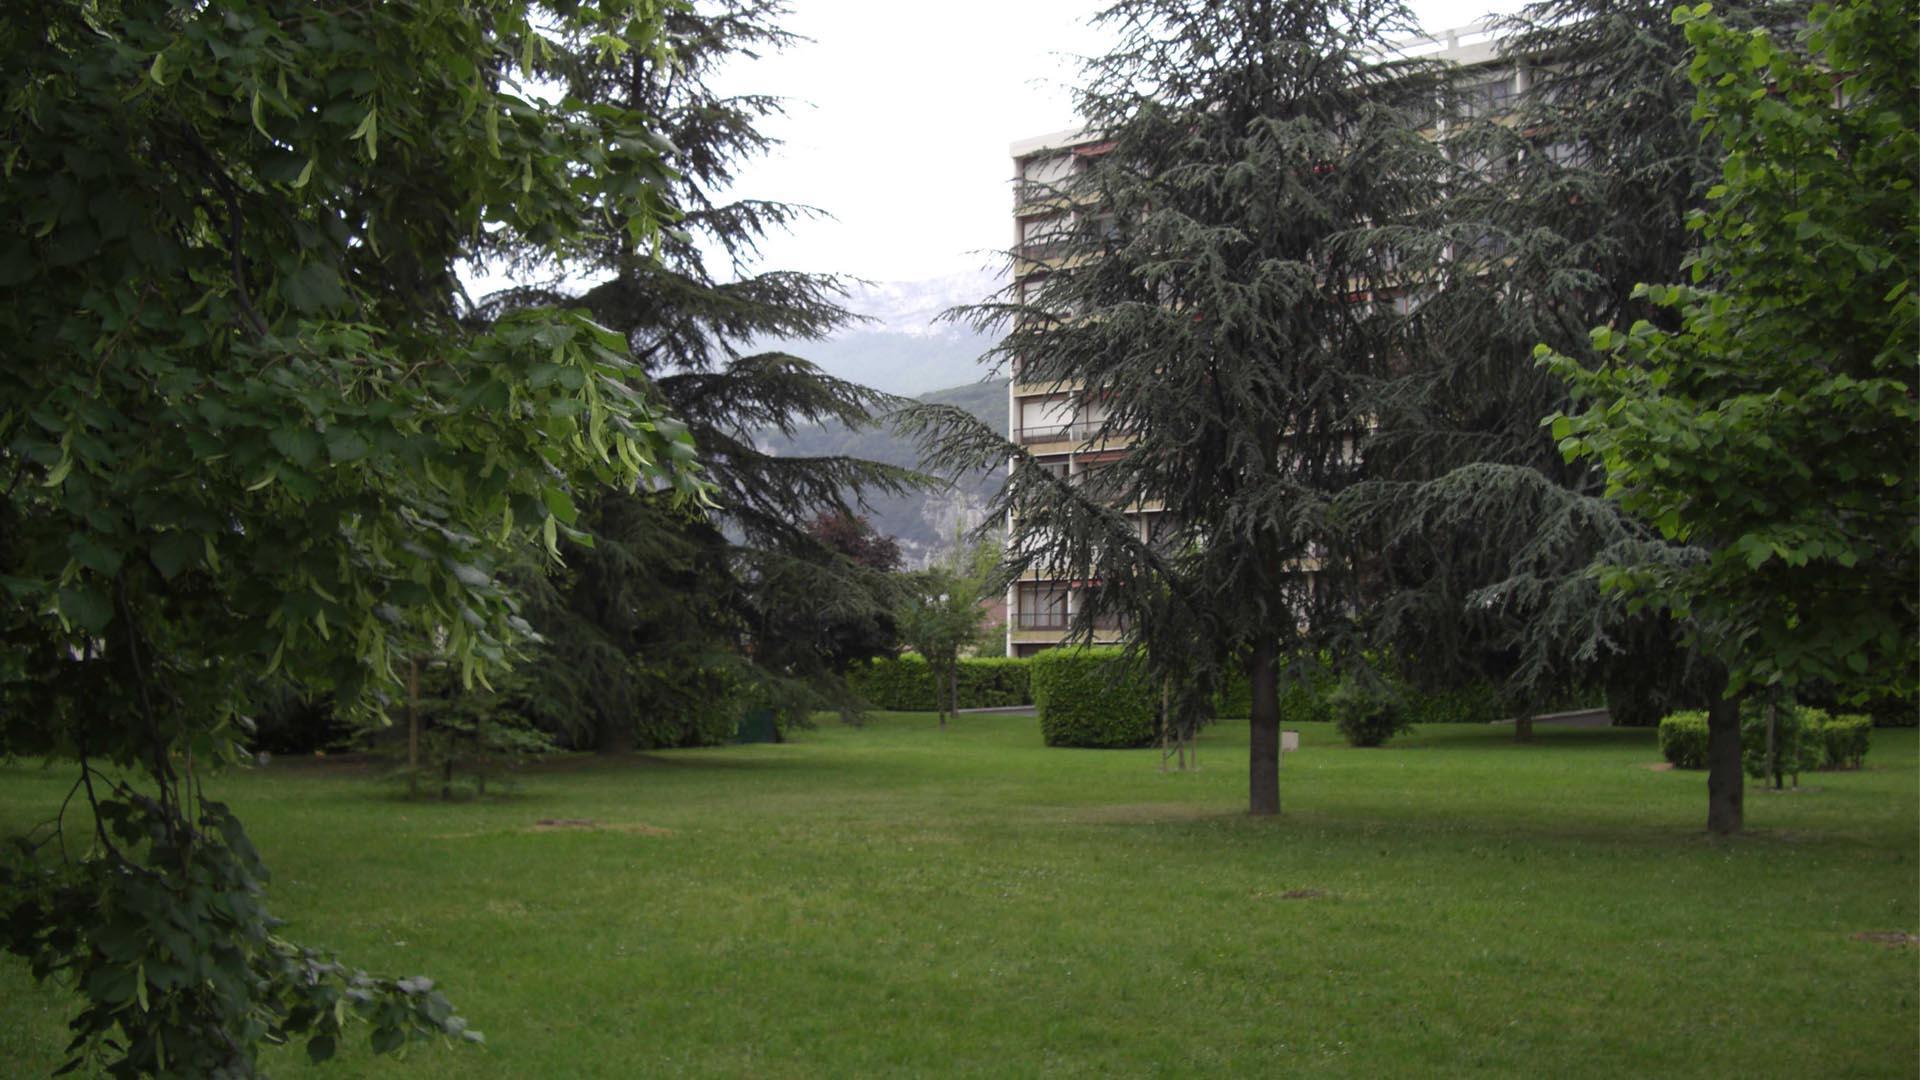 BG Paysage Grenoble